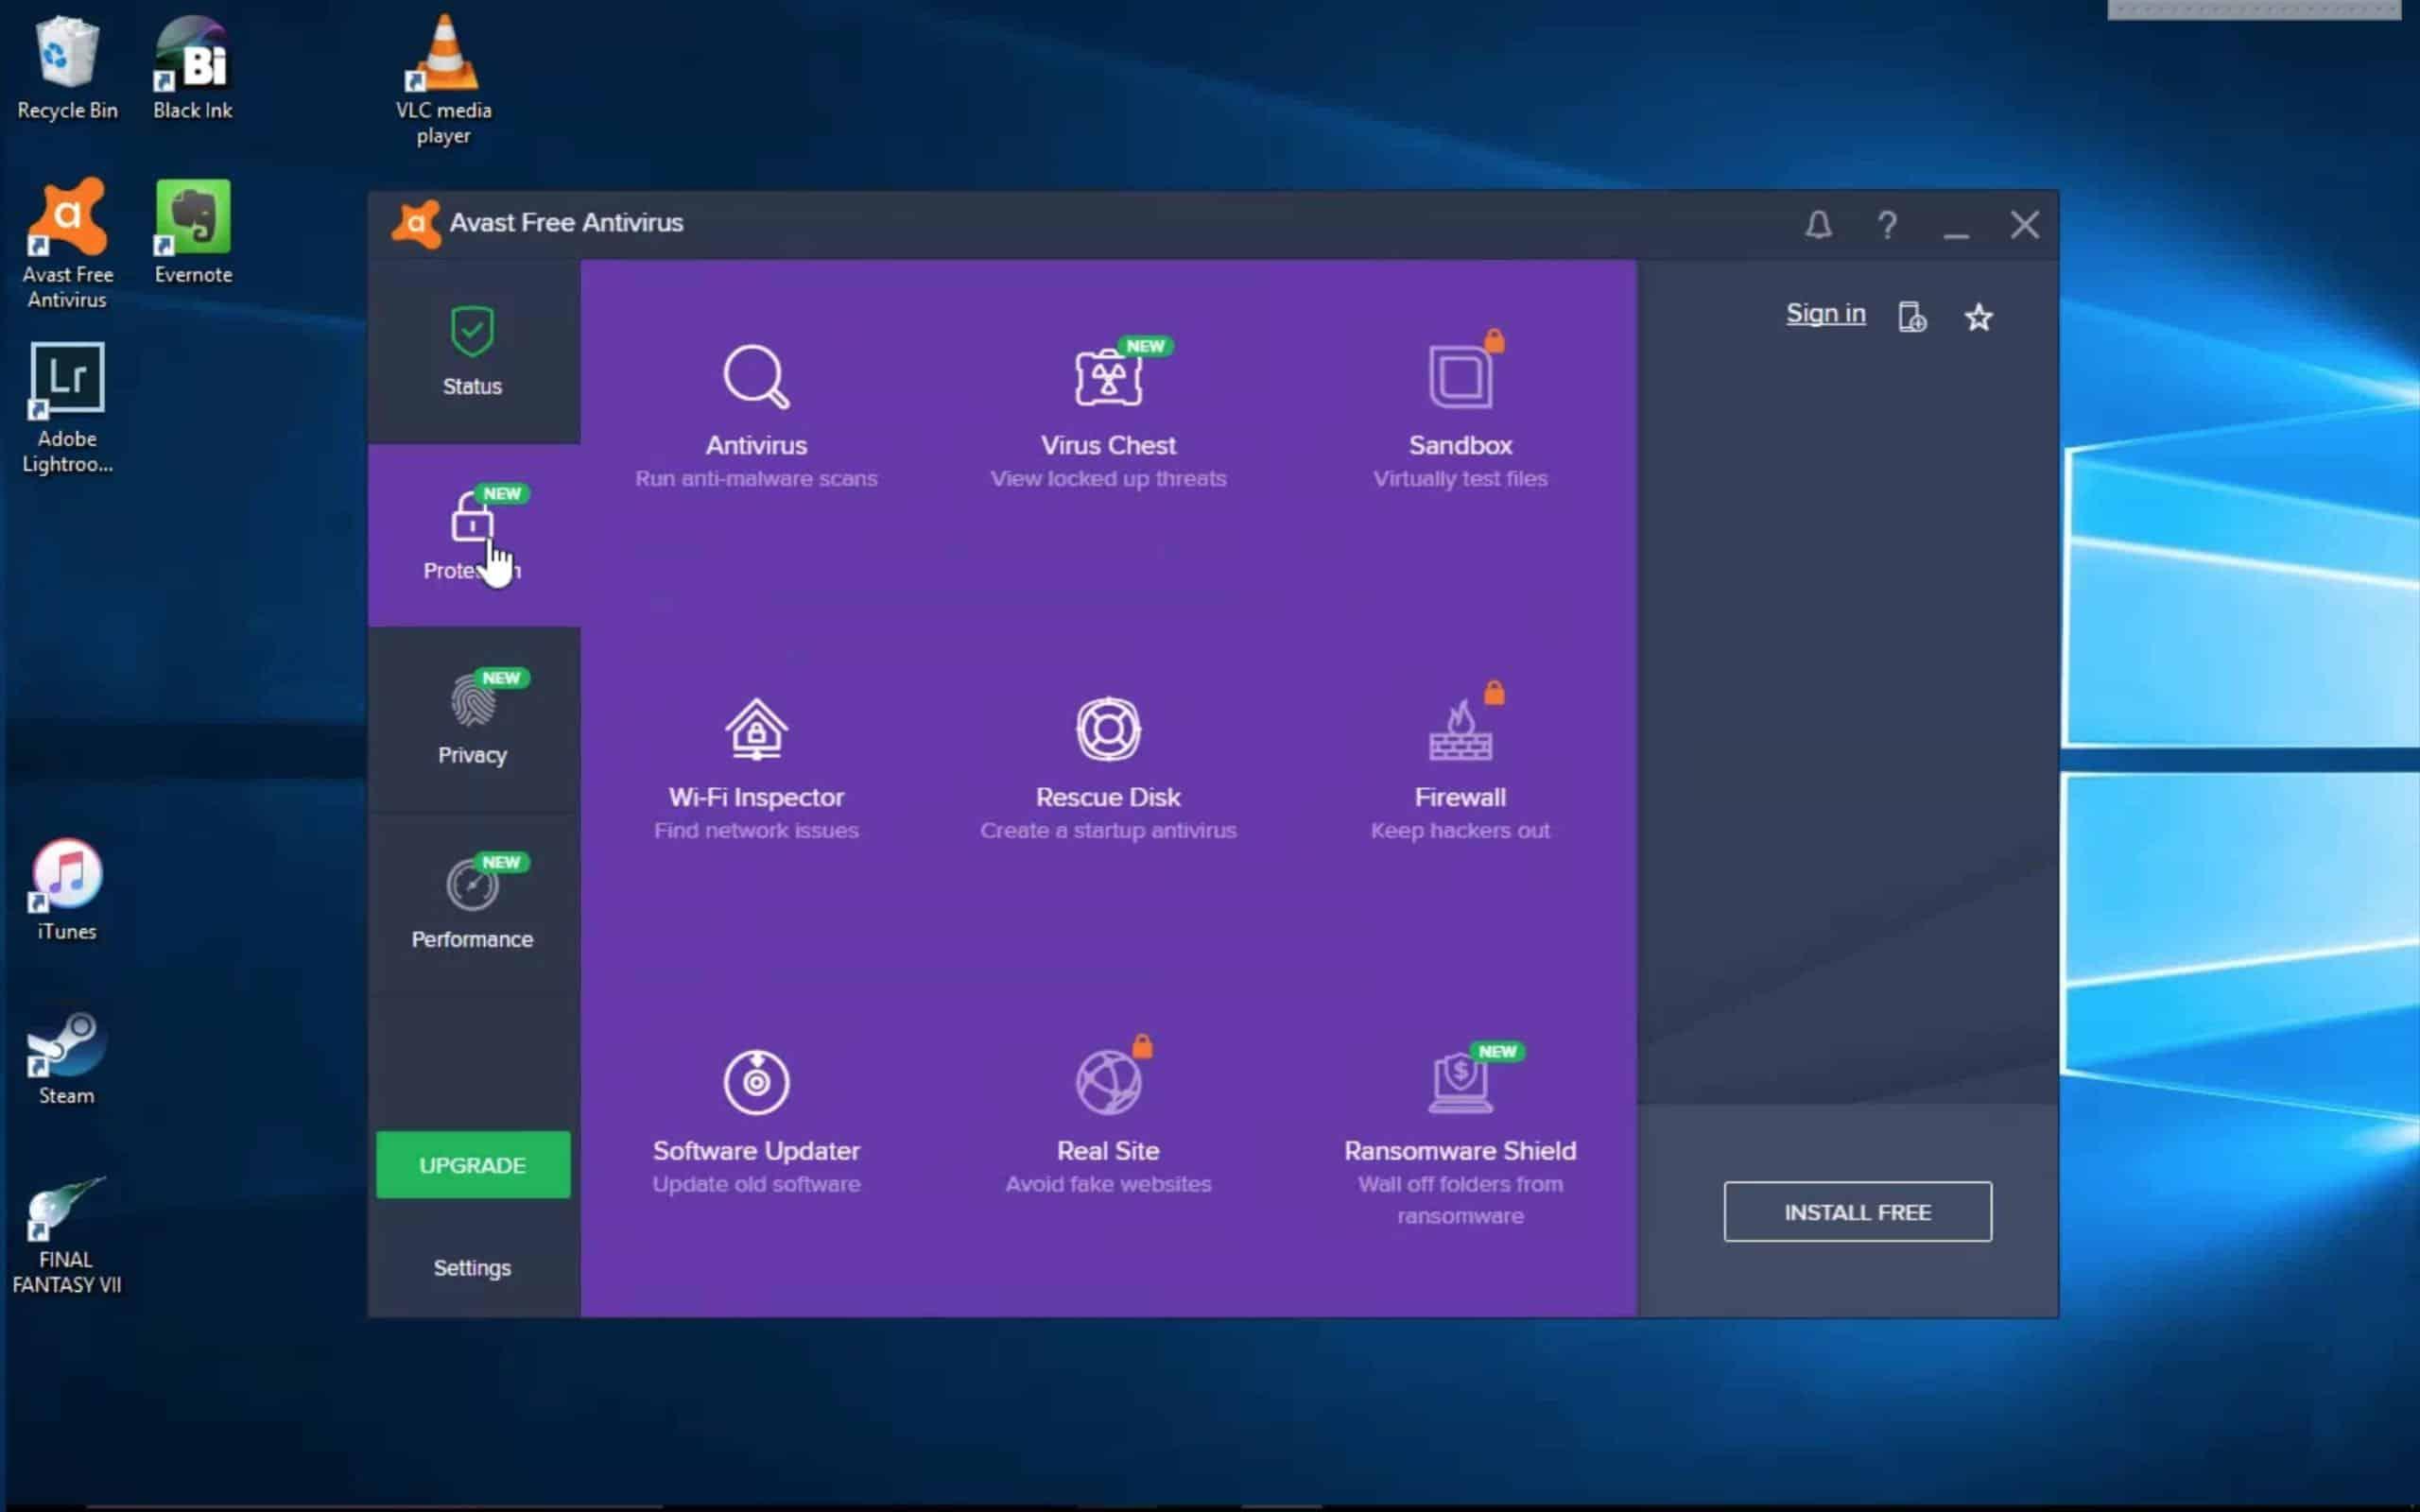 Jalankan pemindai Antivirus berdasarkan permintaan user terlebih dahulu sebelum dijalankan otomatis